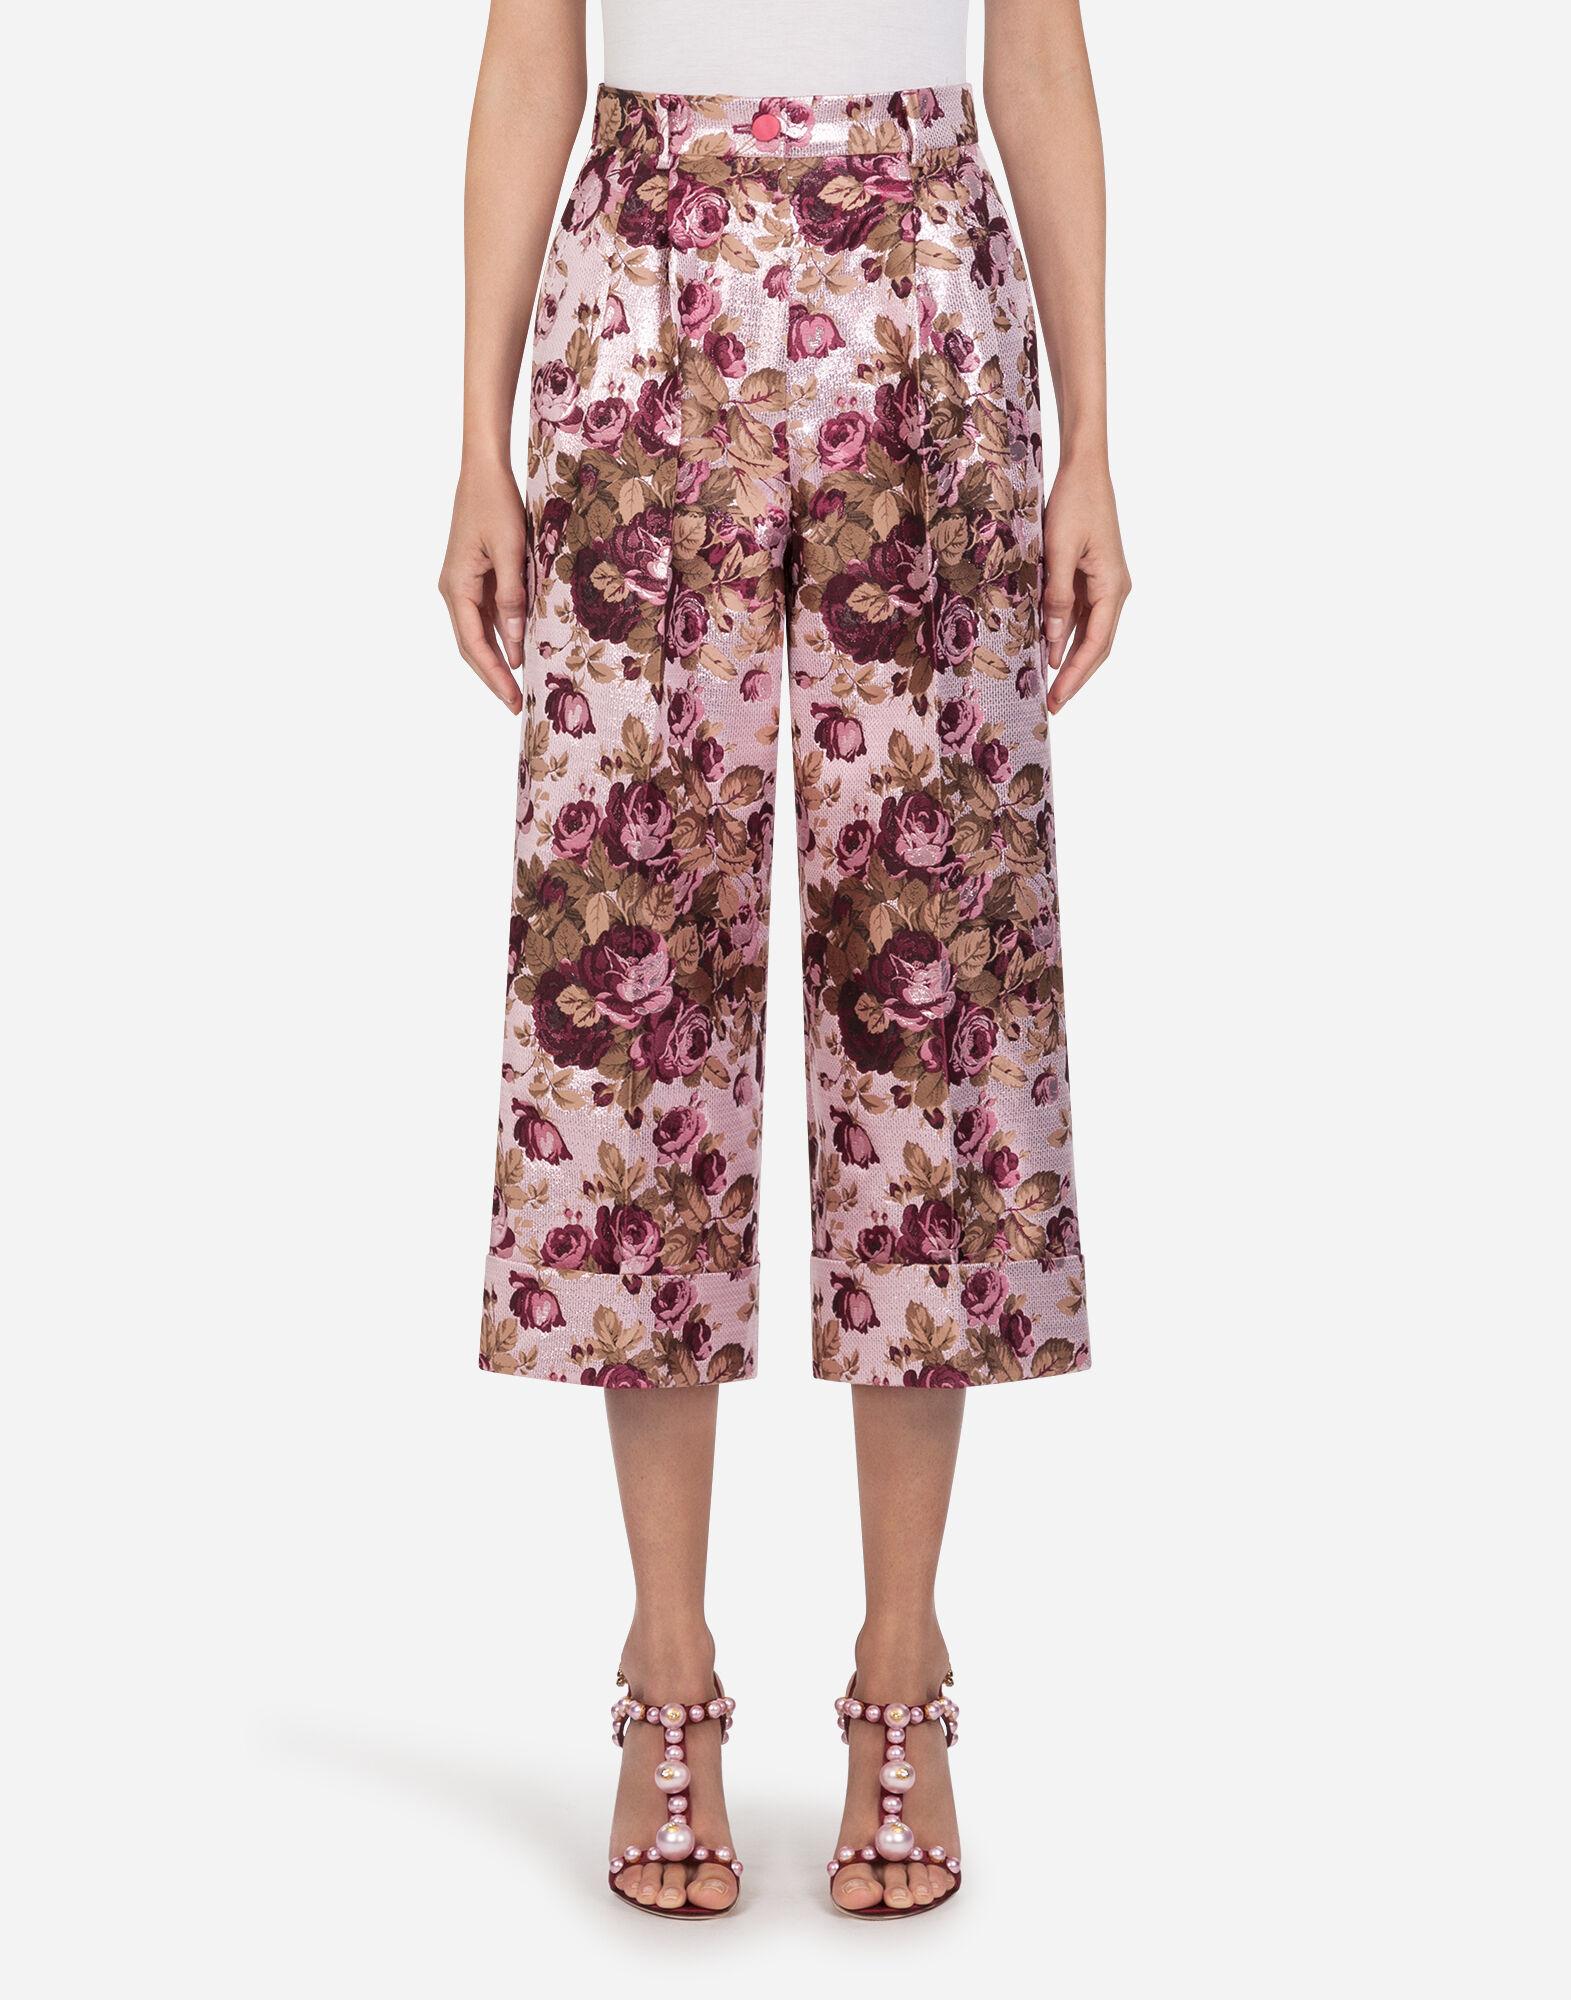 Pantalones Mujer | Dolce&Gabbana PANTALONES CULOTTE EN JACQUARD LÚREX DE FLORES